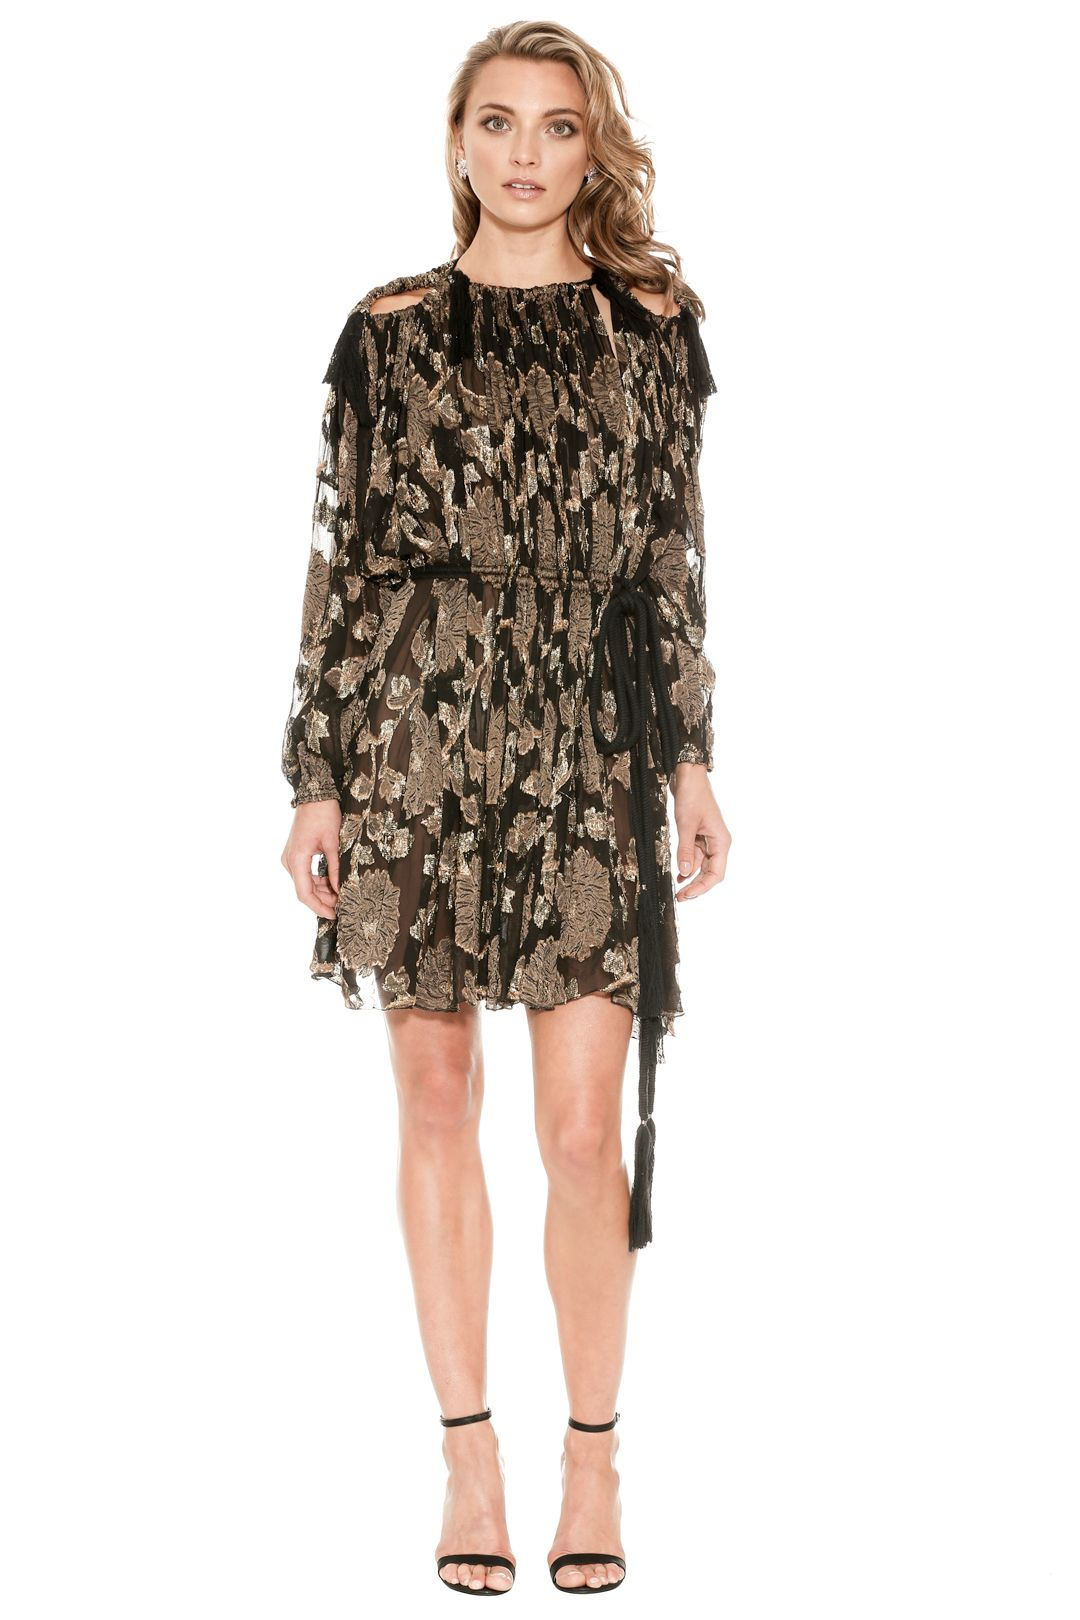 Lanvin - Embroidered Silk Mini Dress - Front